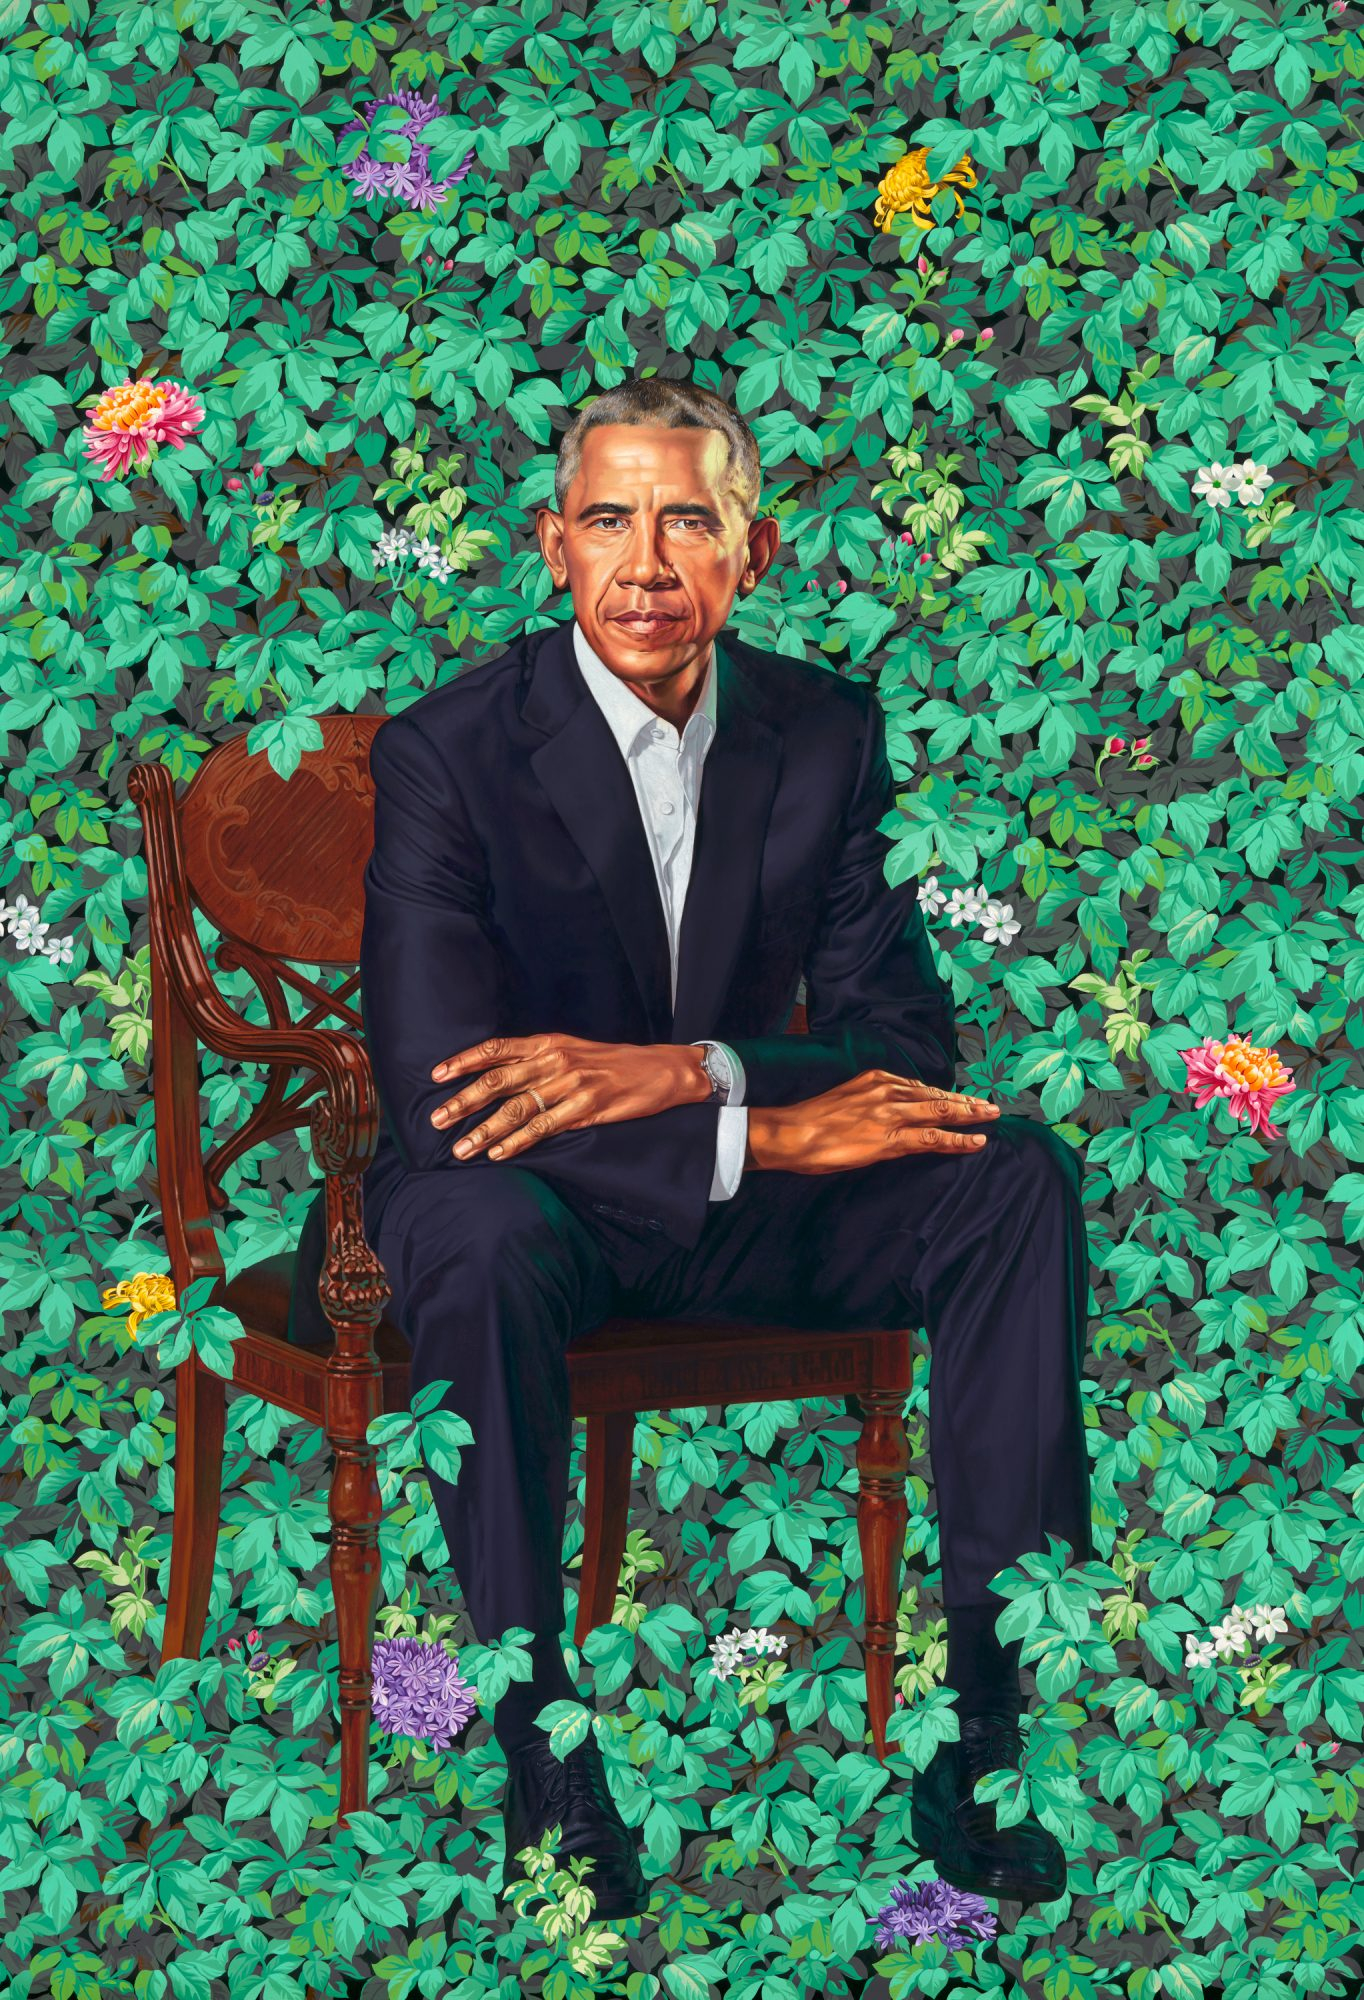 Portrait of President Barack Obama sitting in front of foliage